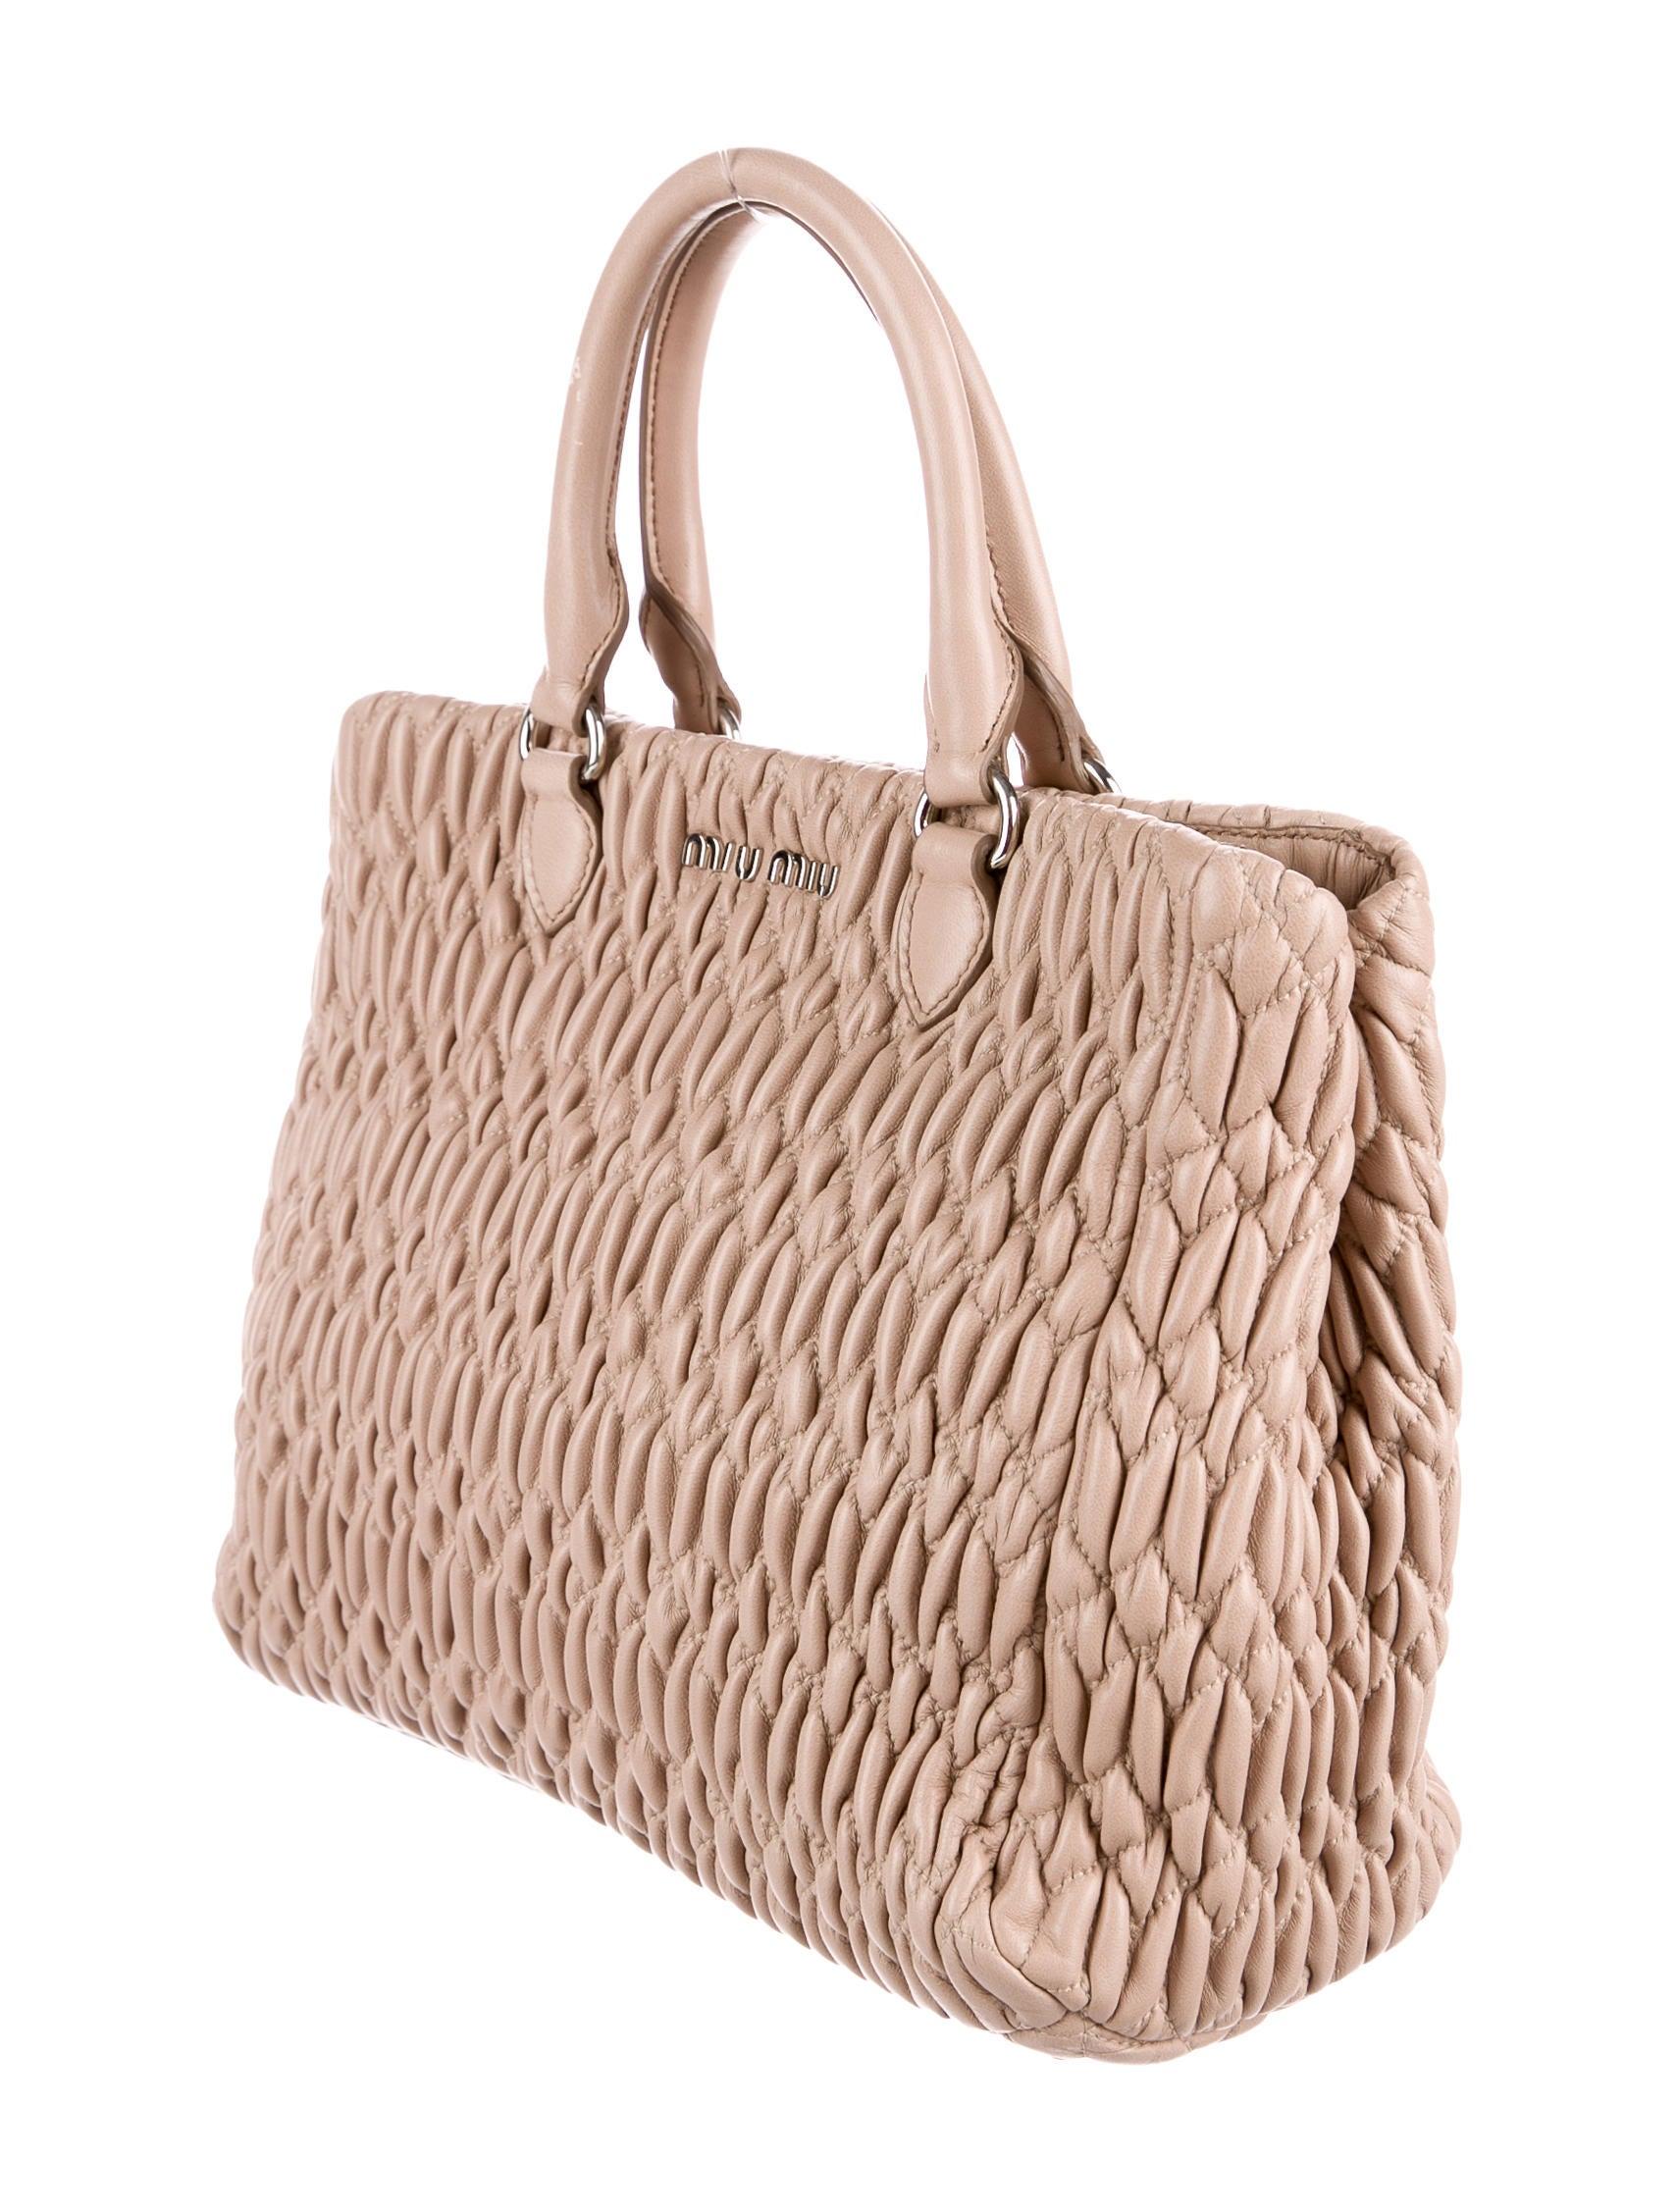 358cbf50ab9 Miu Miu Crystal-Embellished Matelassè Tote - Handbags - MIU52683